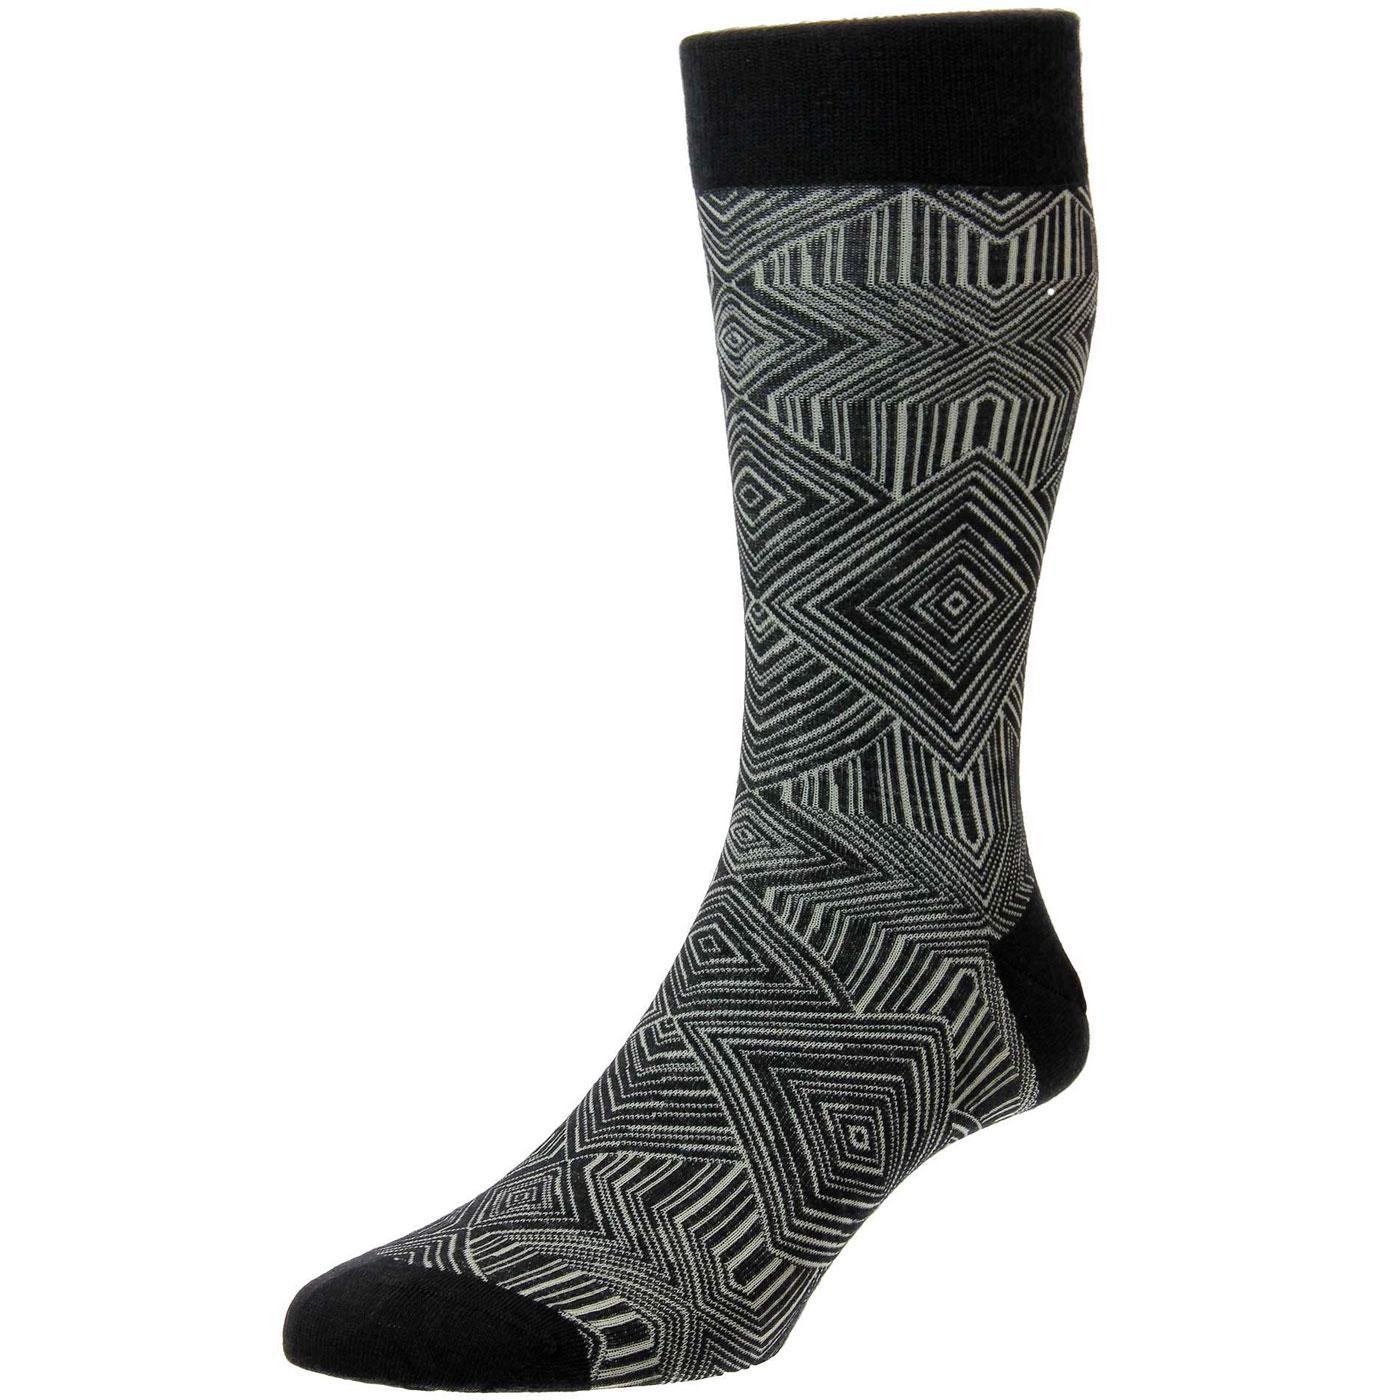 + Glaser PANTHERELLA Op Art Made in England Socks